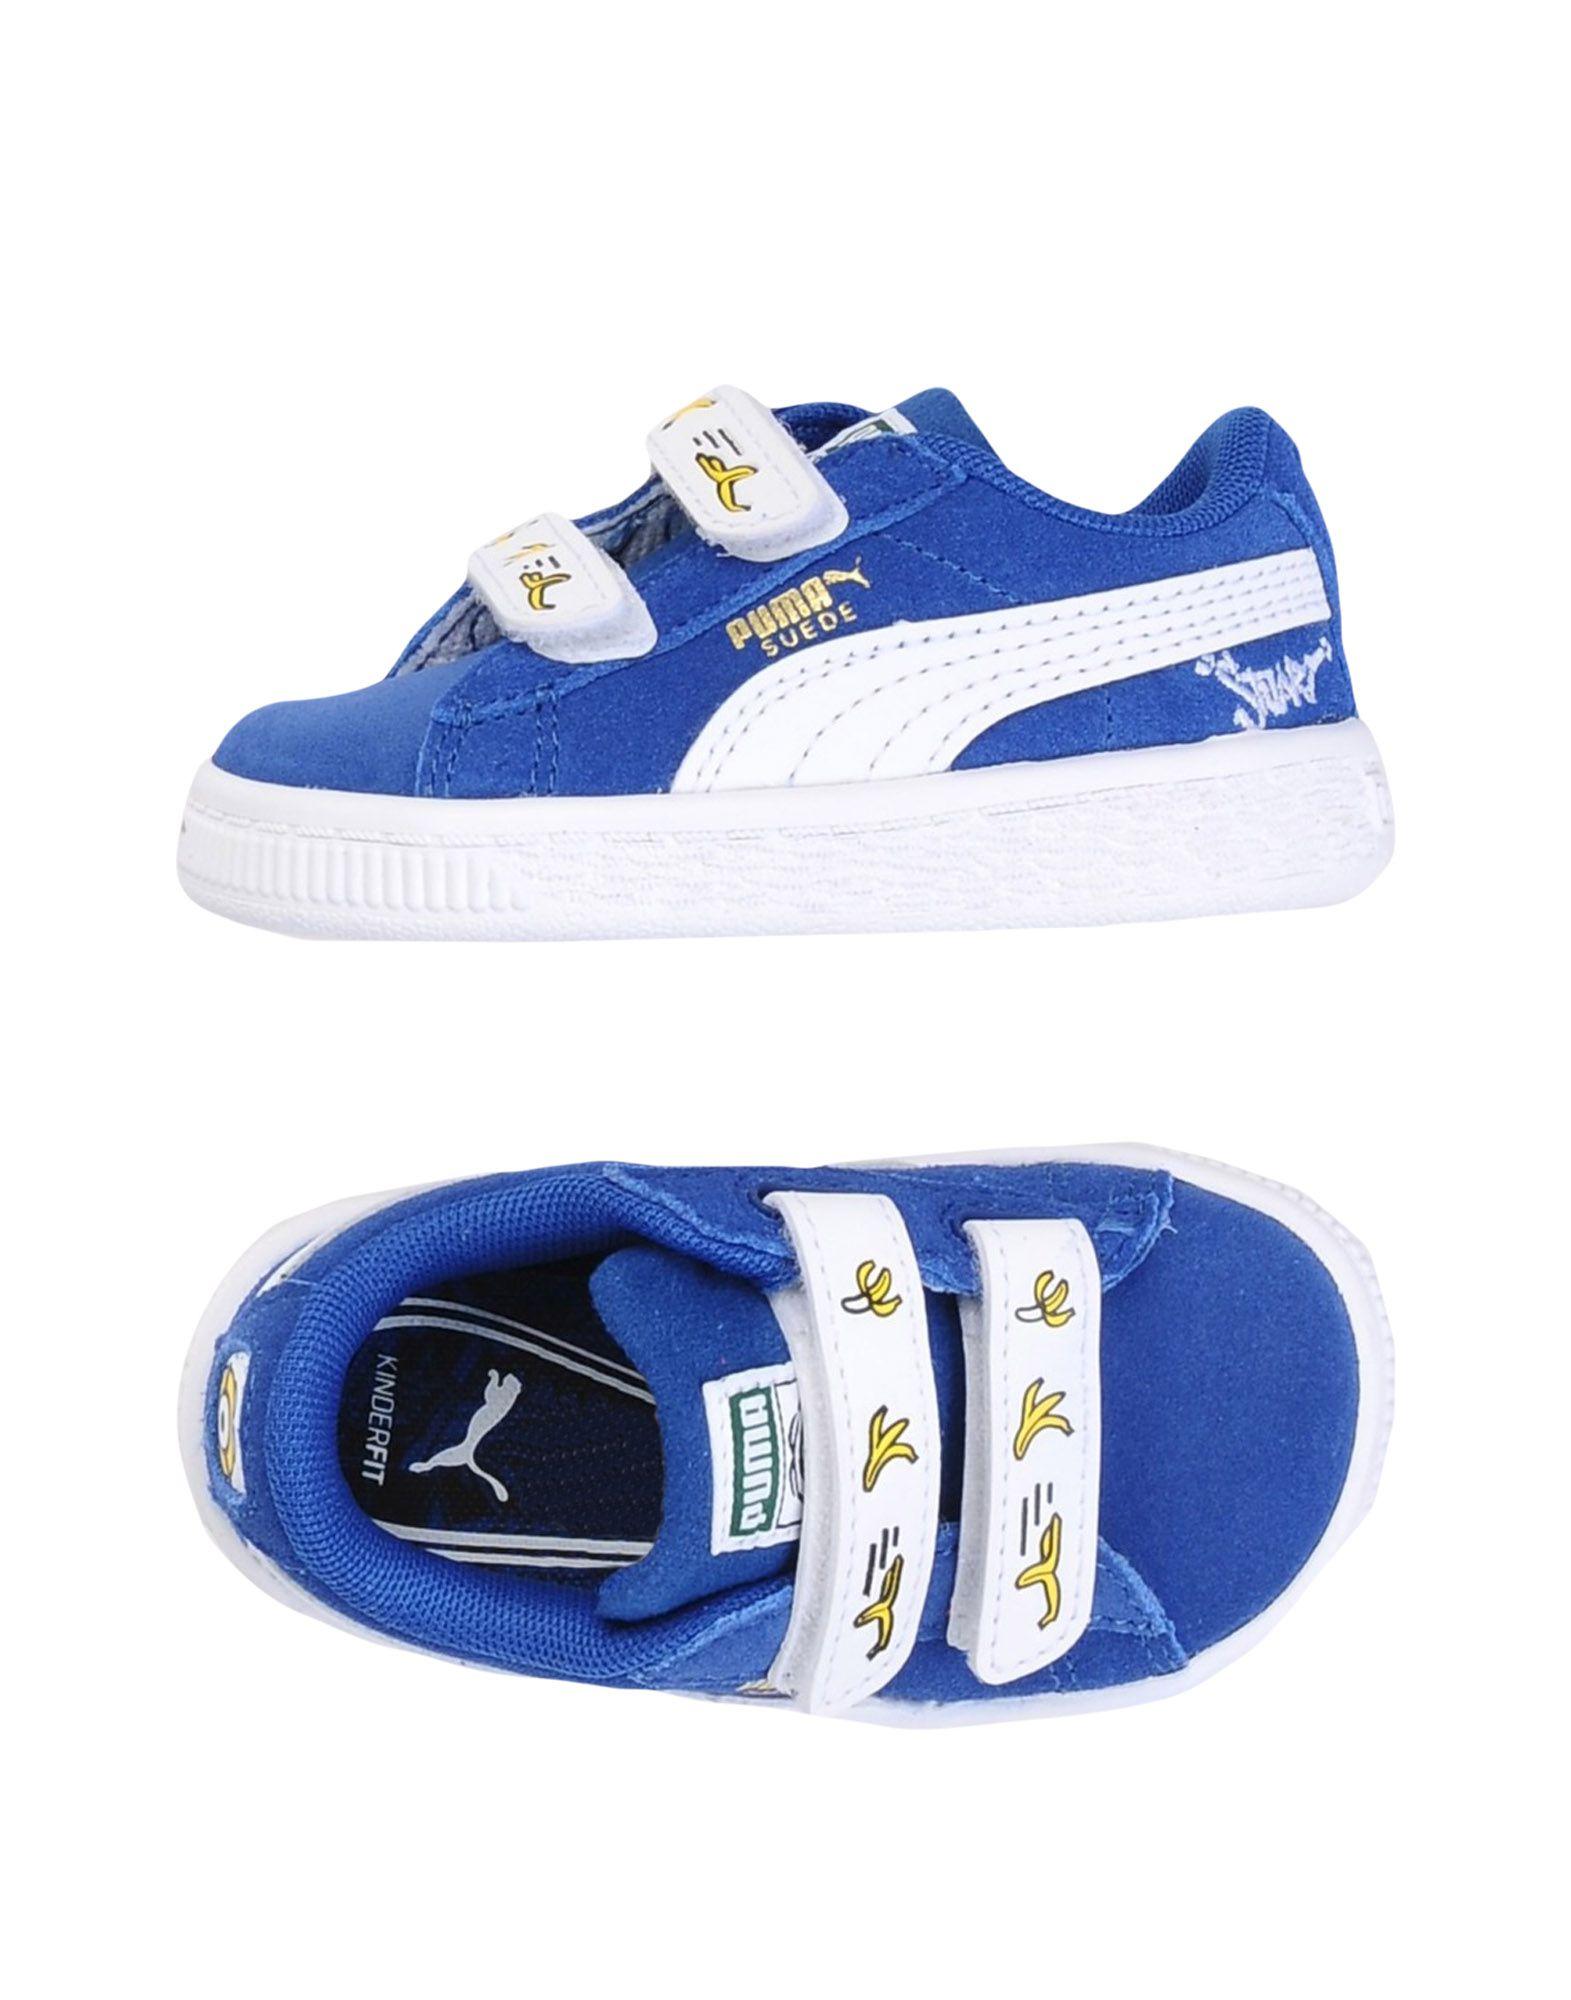 Sneakers bicolore con chiusura velcro per bambina Puma eWgBSvGBg0